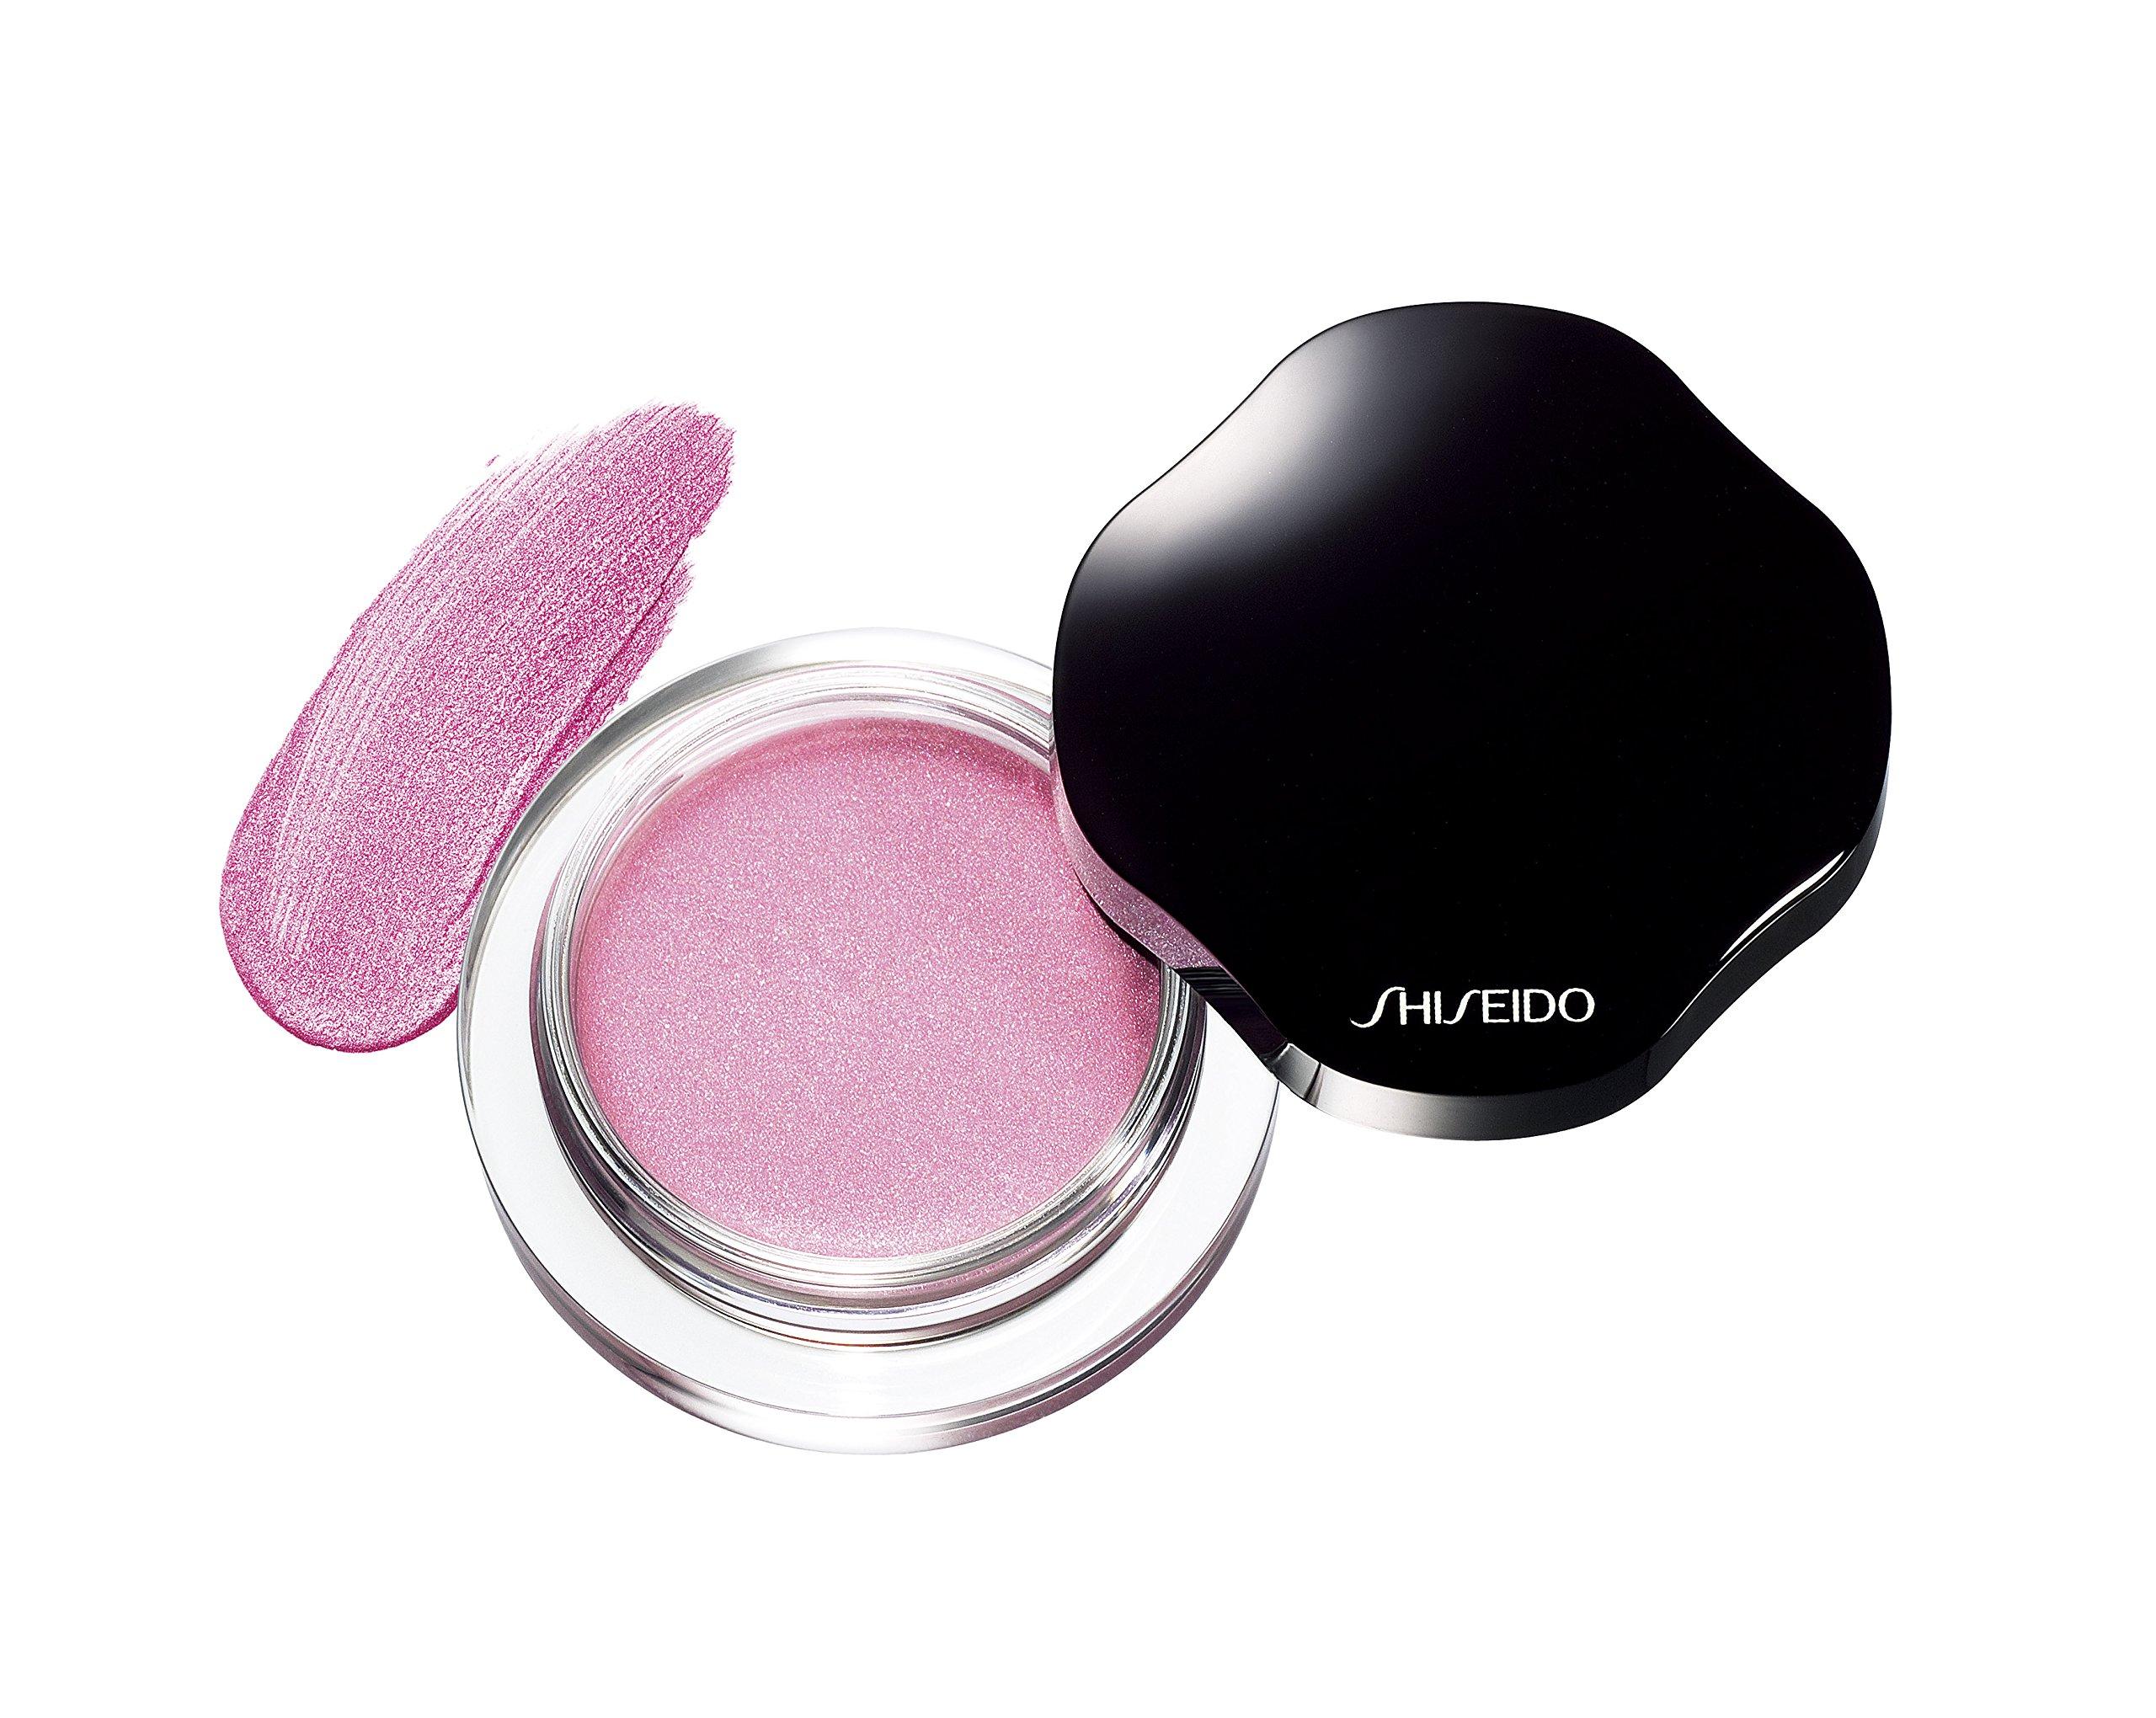 Shiseido Shimmering Cream Eye Color for Women, No. PK302 Magnolia, 0.21 oz